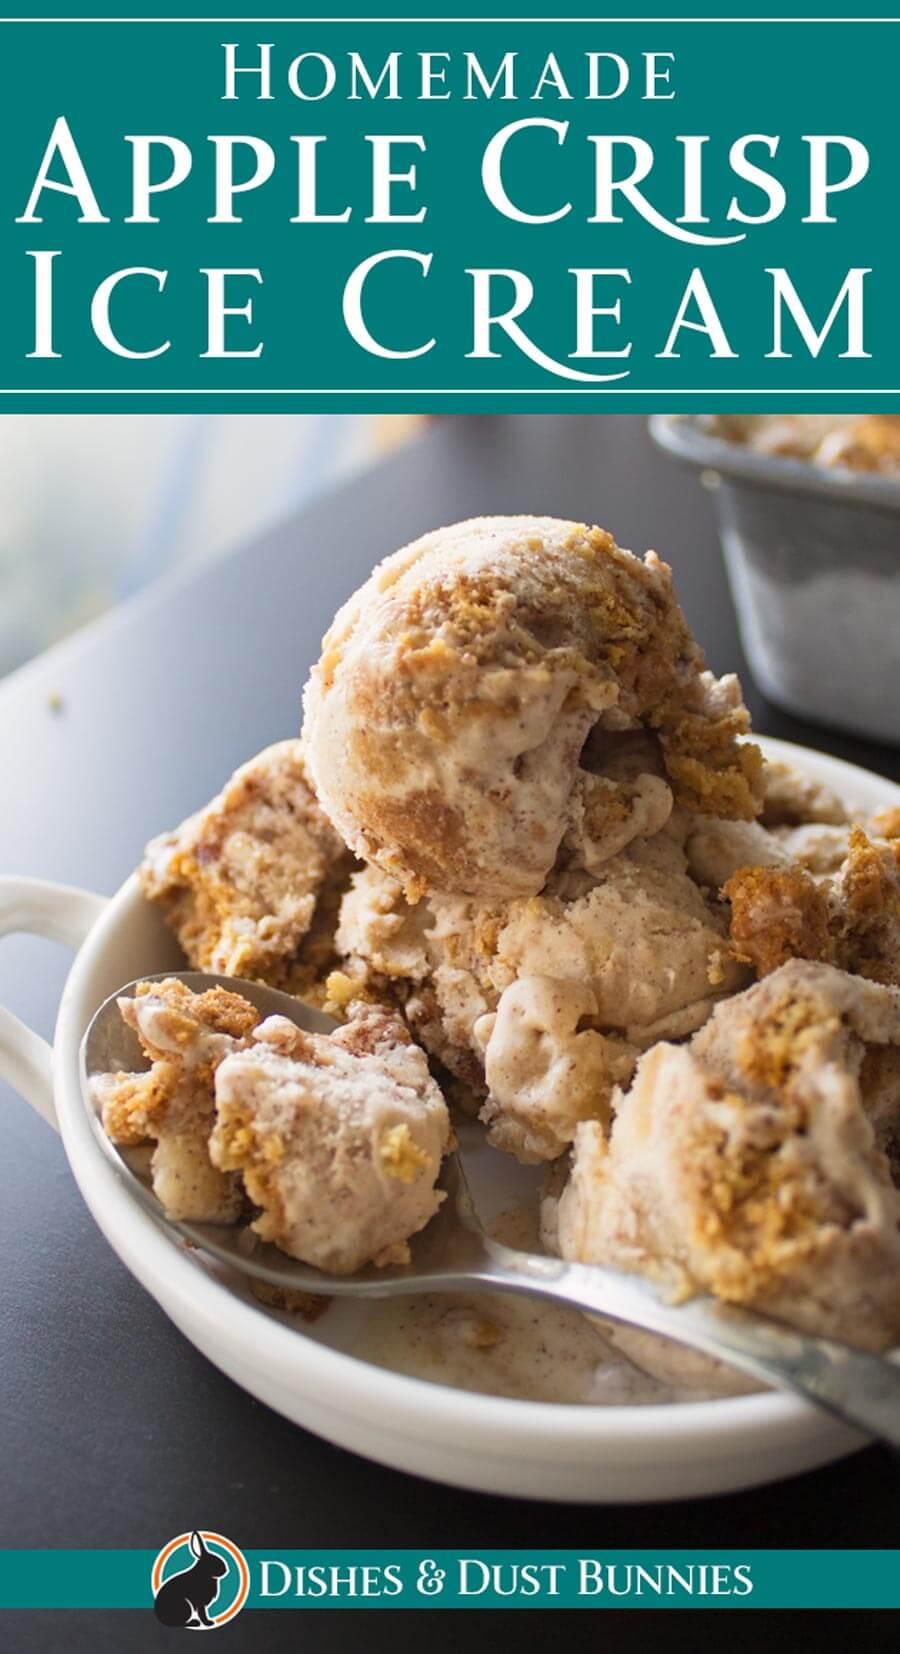 Homemade Apple Crisp Ice Cream via @mvdustbunnies